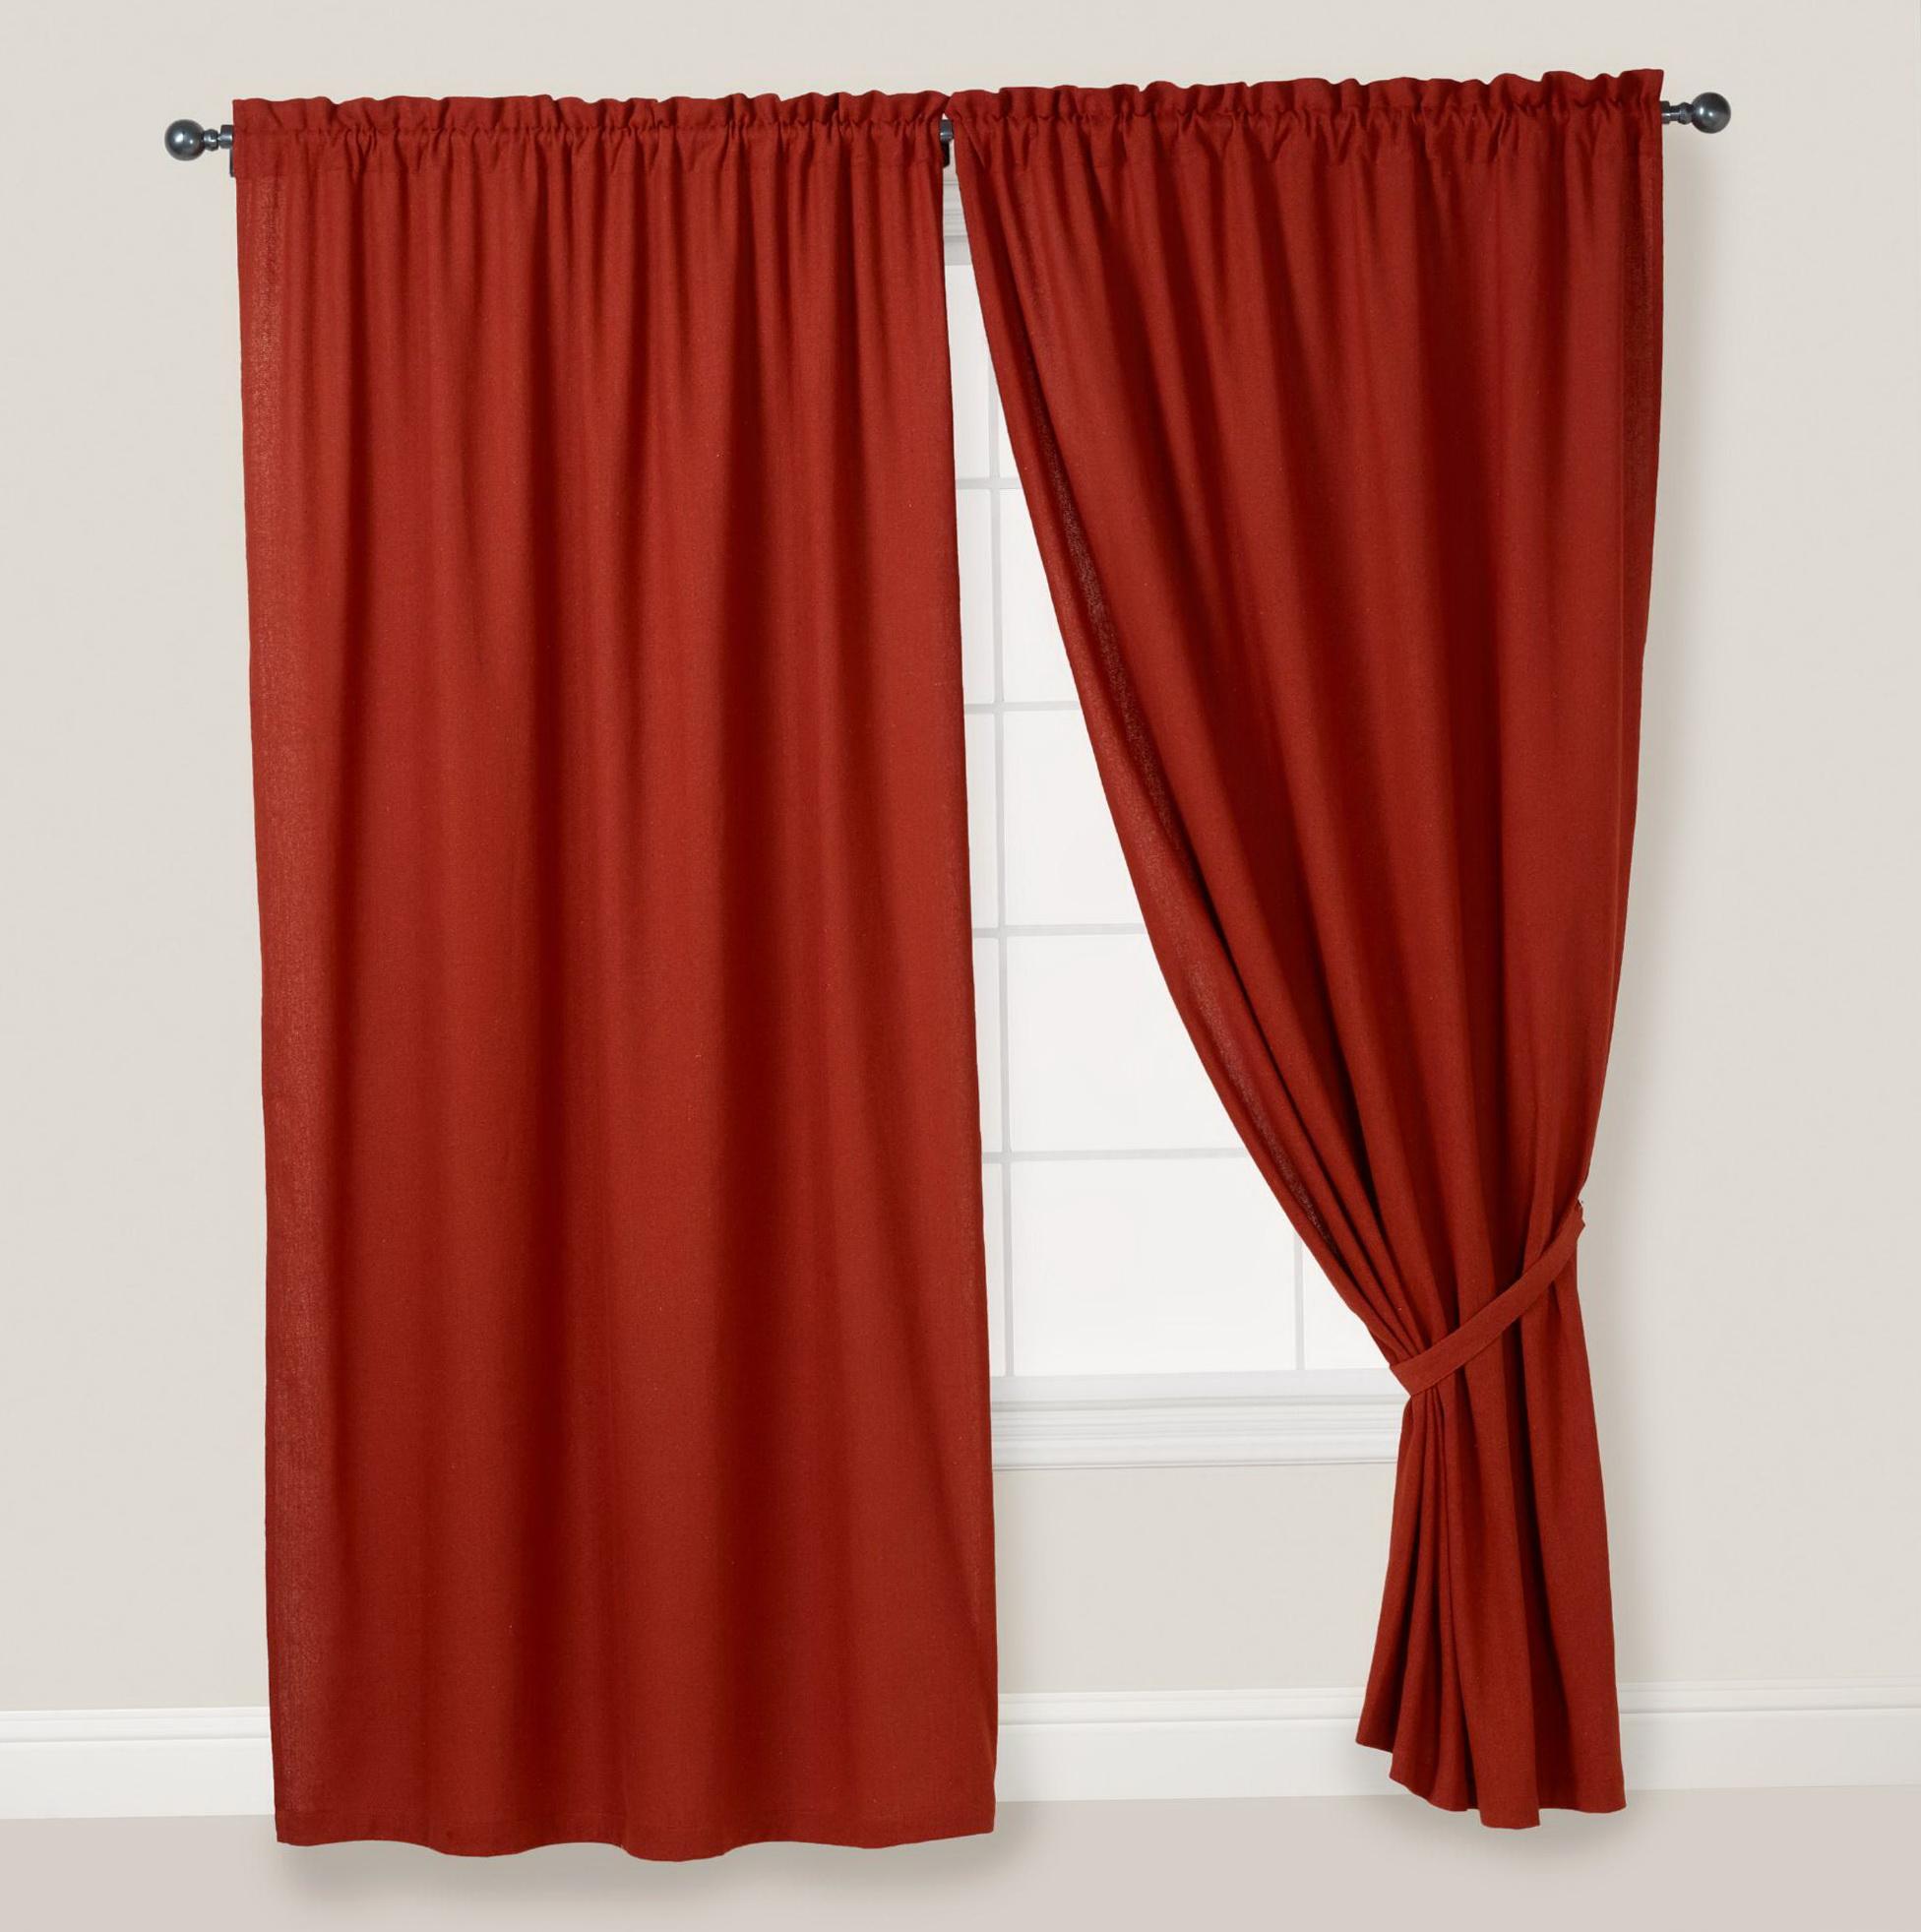 Curtains On Sale Online Home Design Ideas